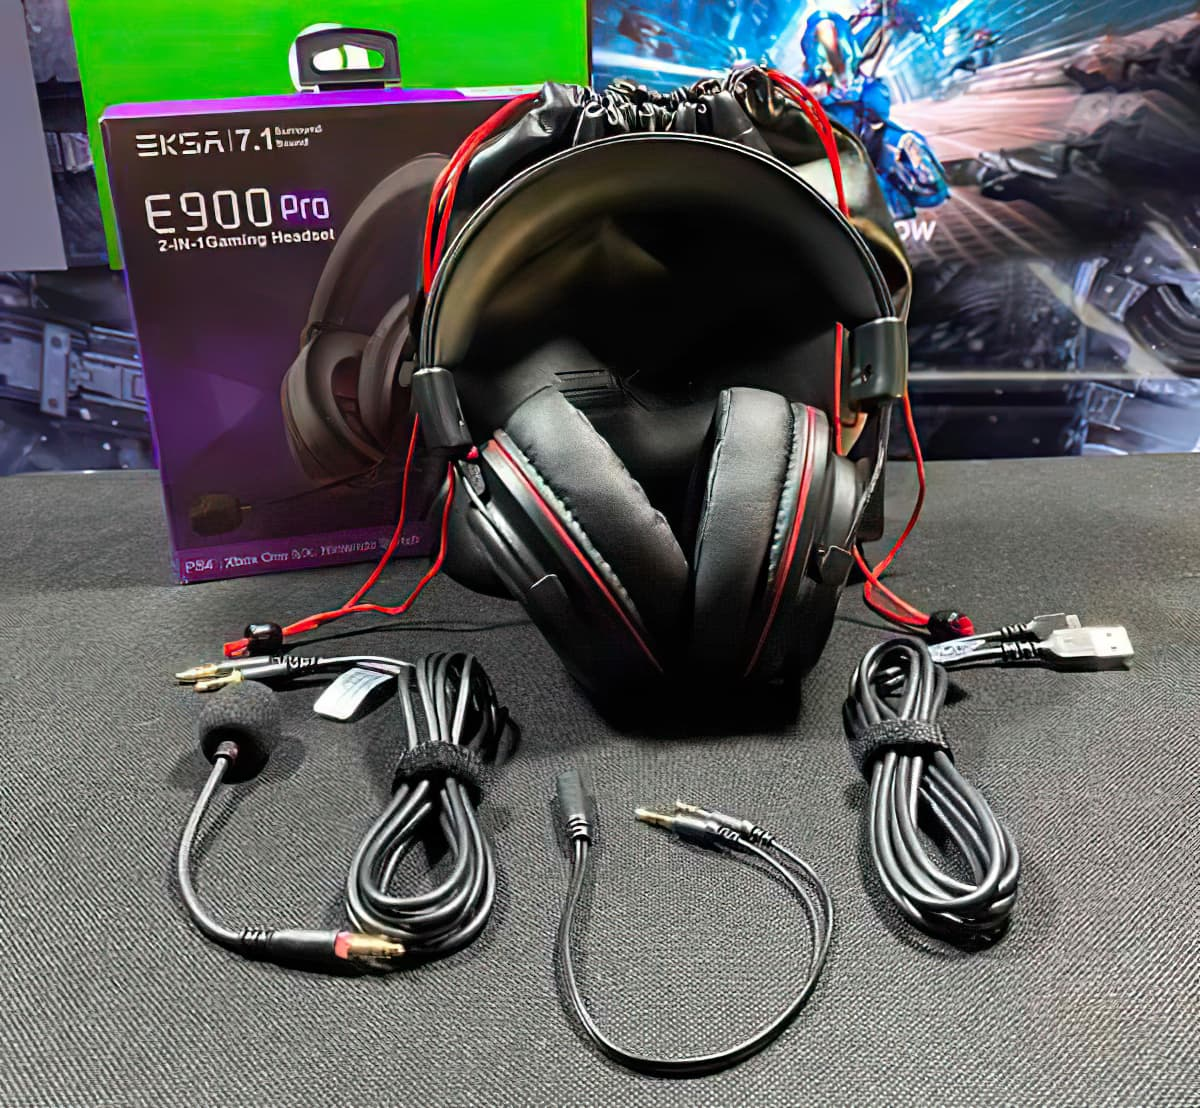 EKSA E900 Pro Headset - Review